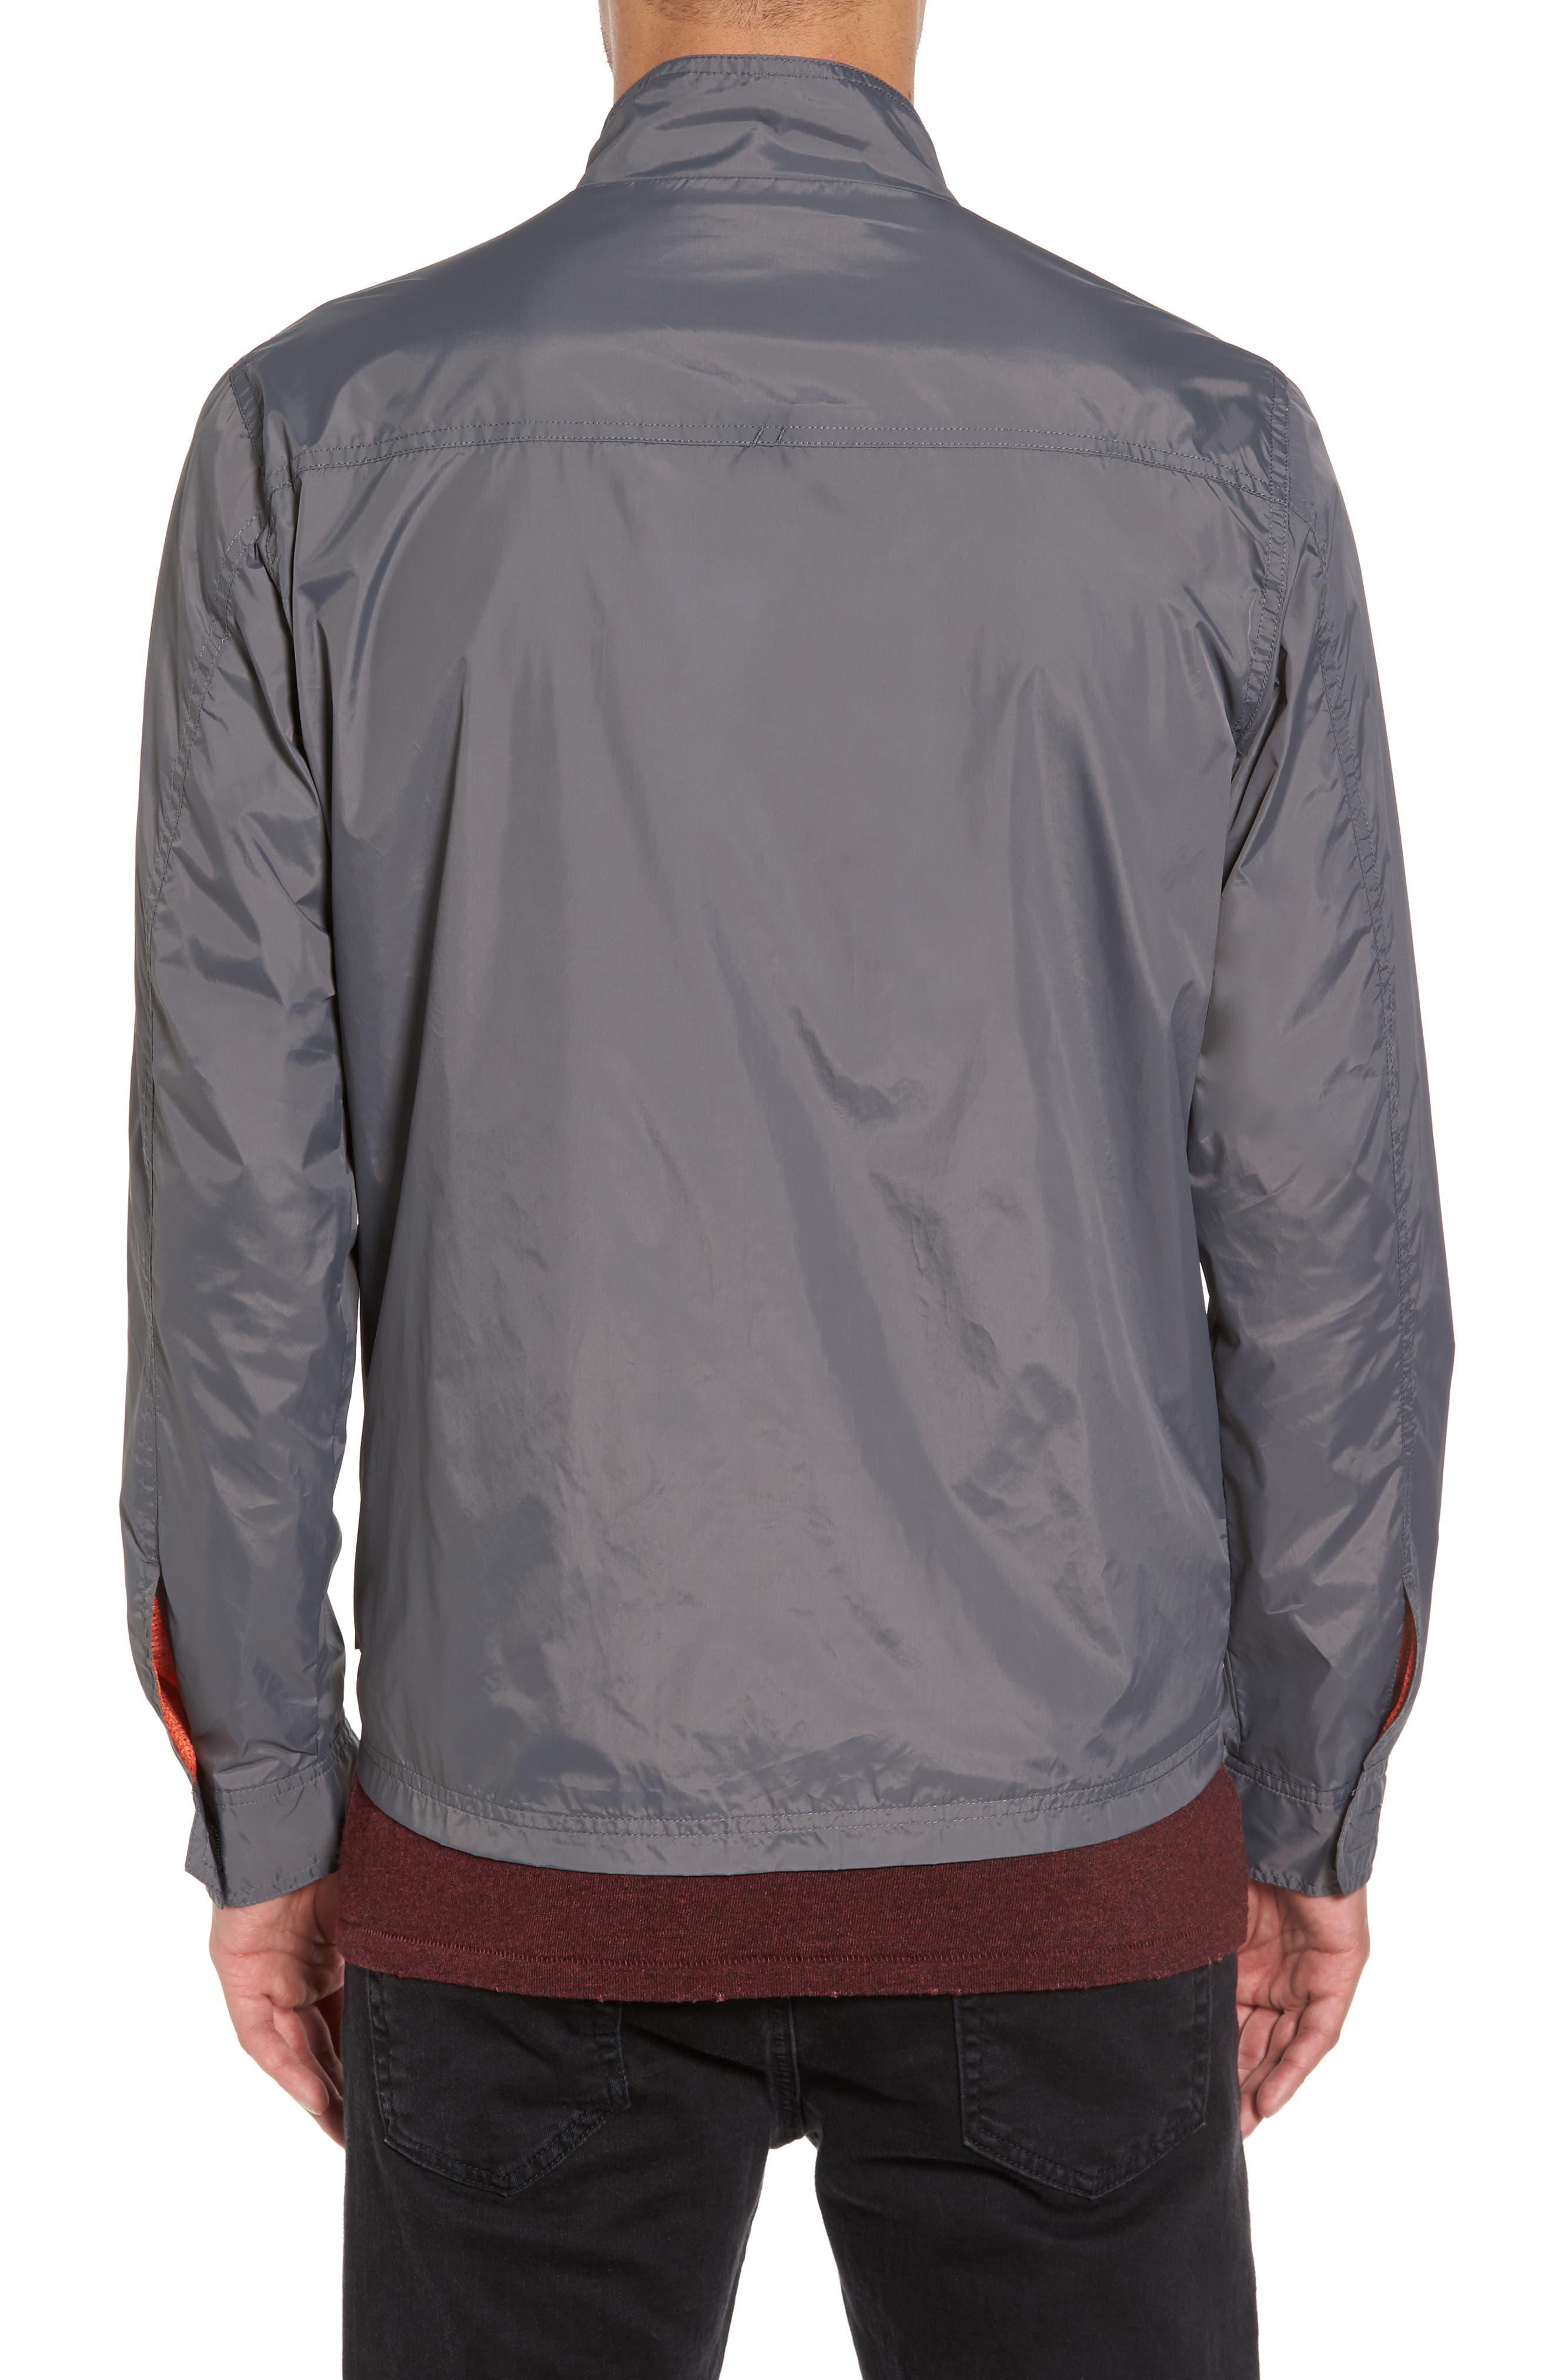 Staple Jacket,                             Alternate thumbnail 2, color,                             Grey